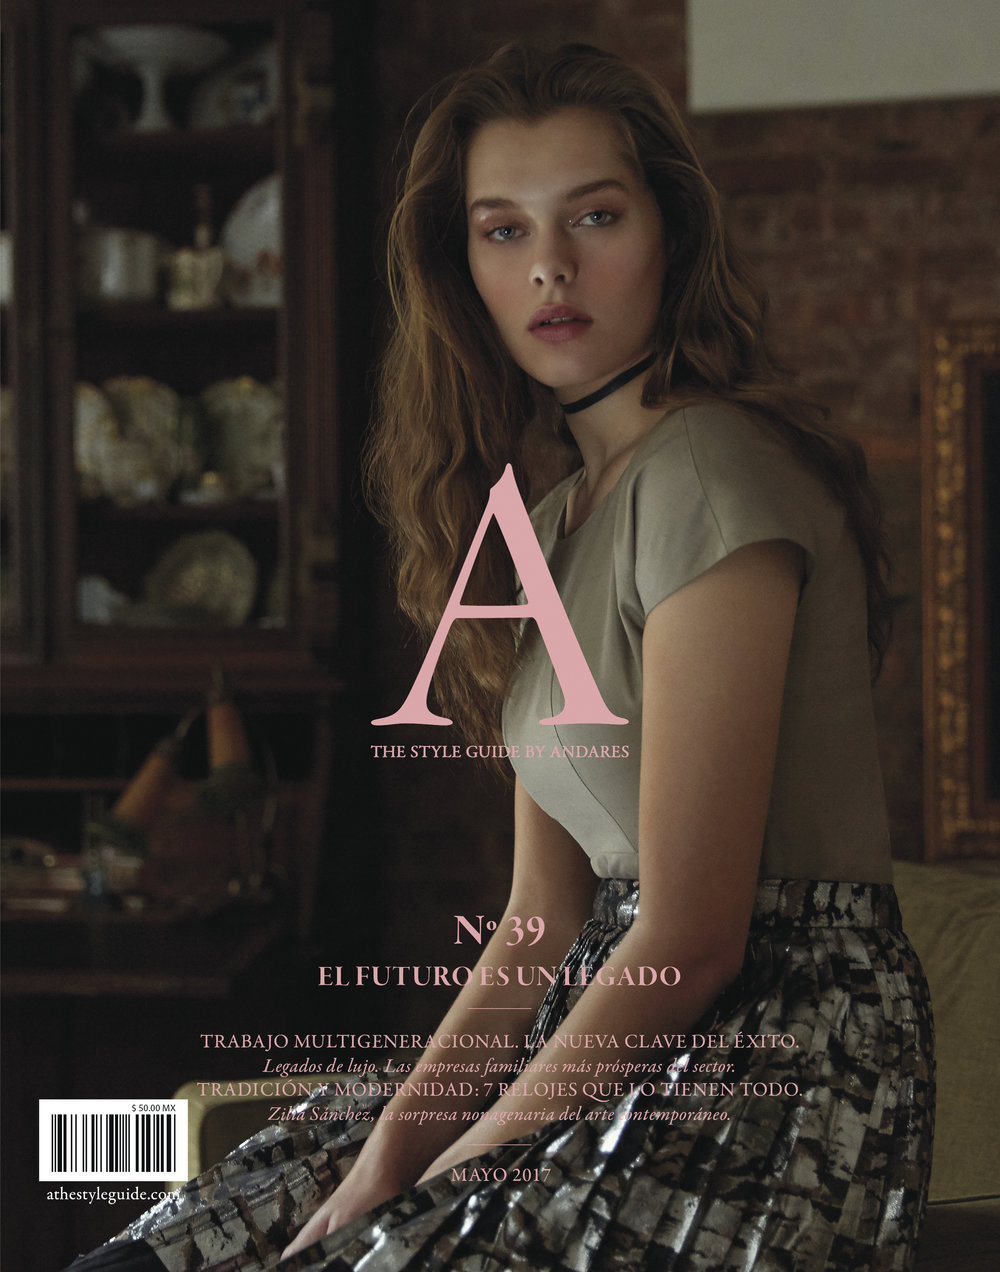 The Style Guide Cover Mejia Bendezu.jpeg